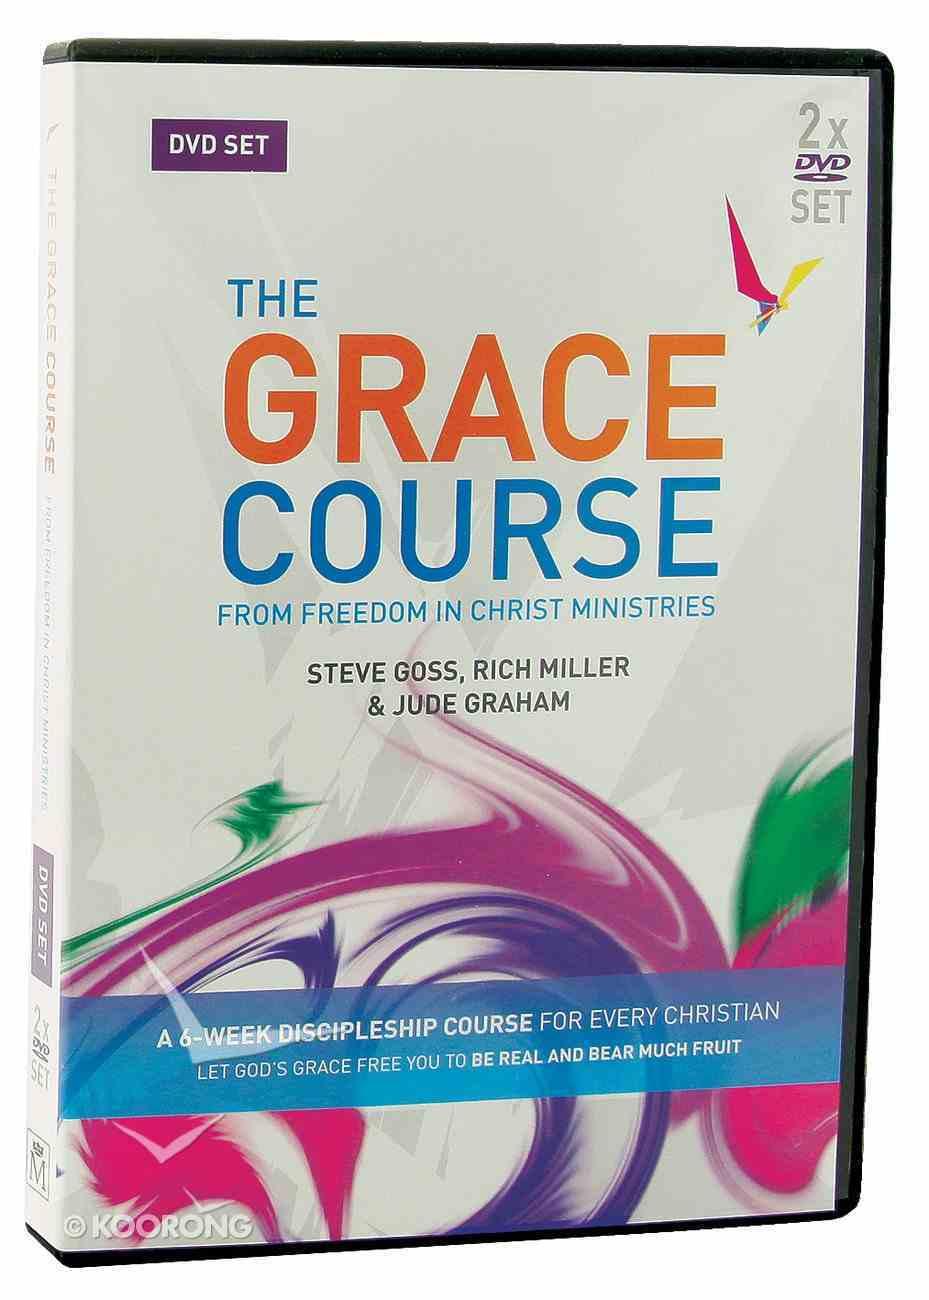 The Grace Course (DVD X 2) (The Grace Course) DVD